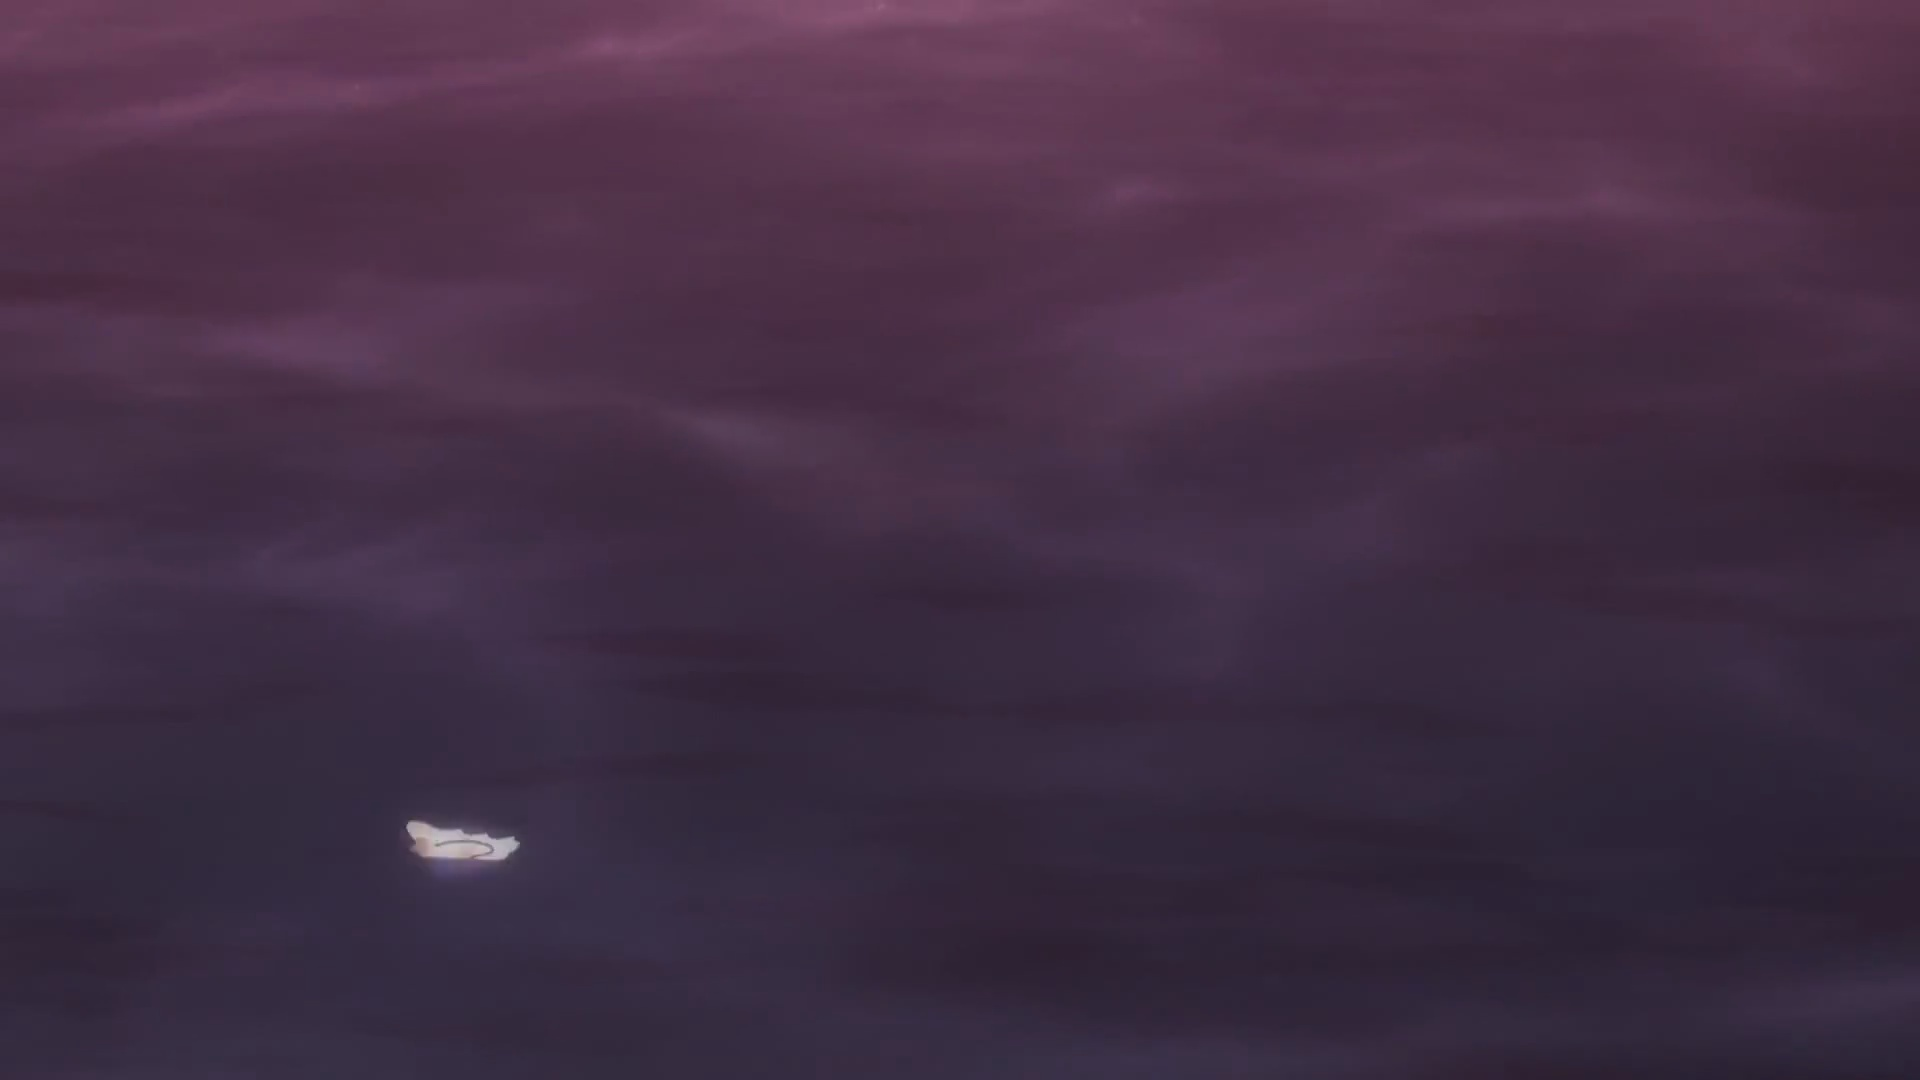 Anime Multiple Splashes Sound